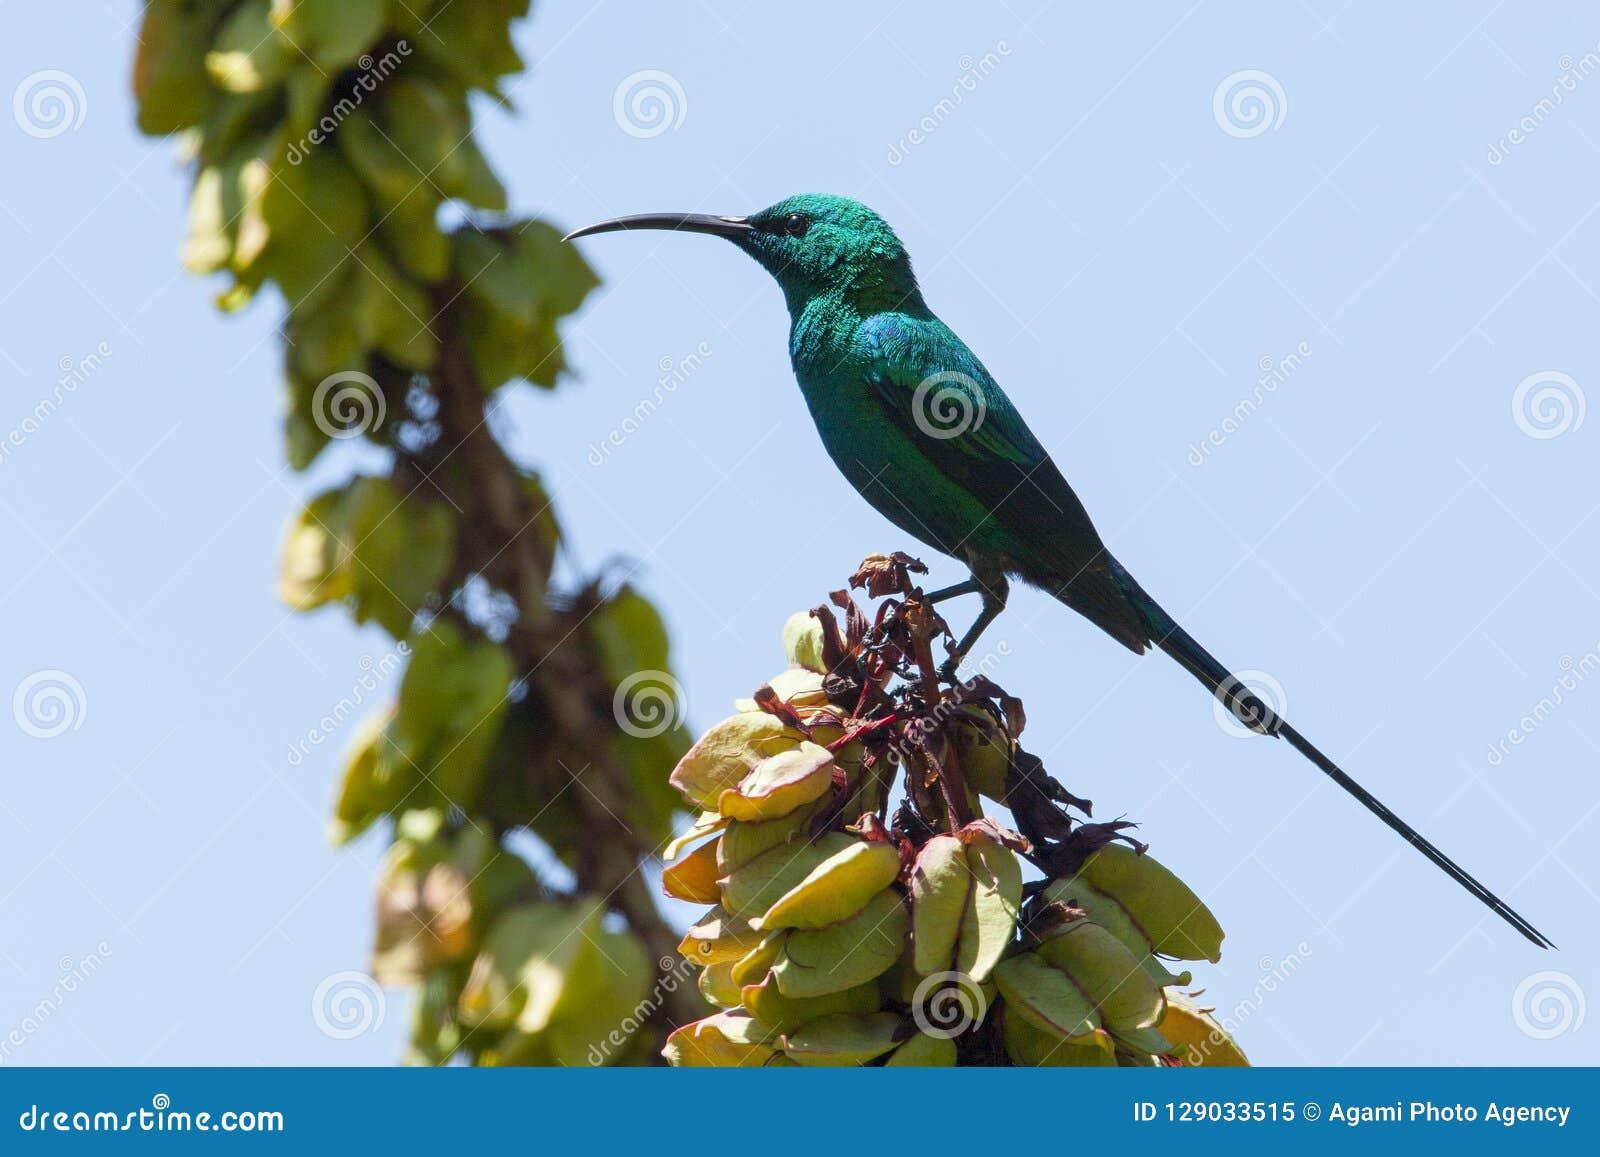 Emeraldhoningzuiger, Malachite Sunbird, Nectarinia famosa